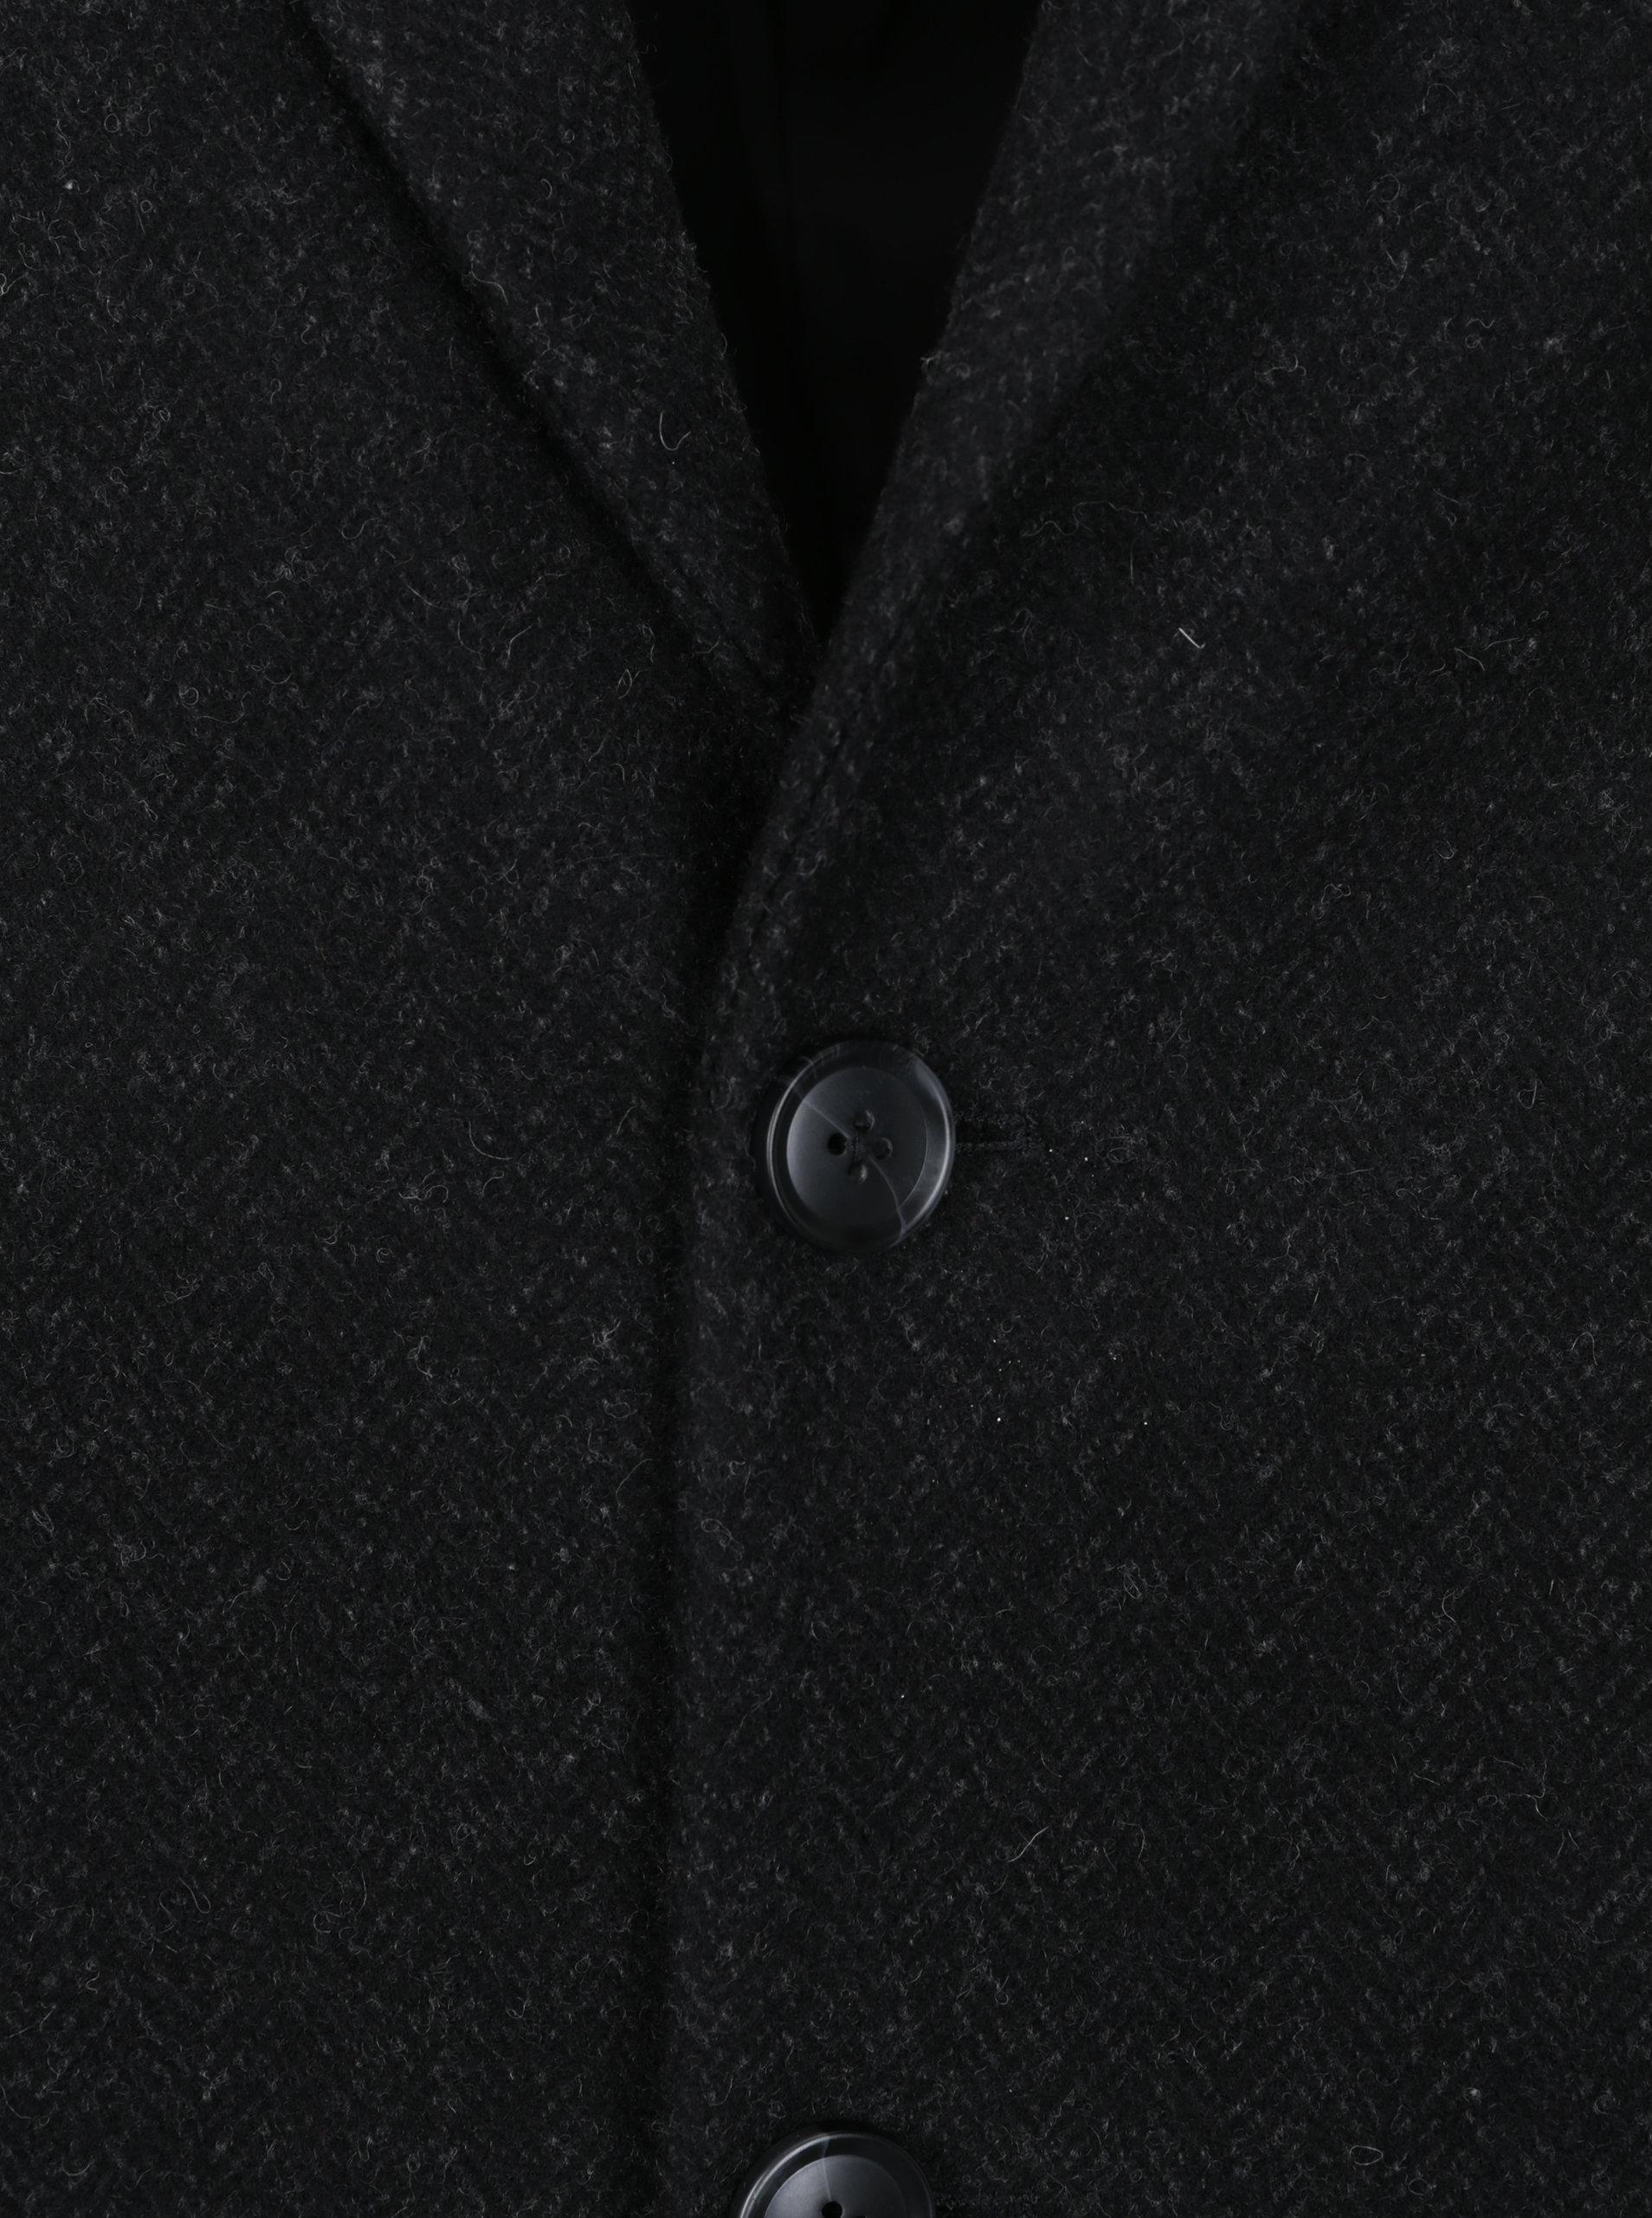 Čierny pánsky kabát s prímesou vlny Broadway Ovtave ... ccee9cef1bb